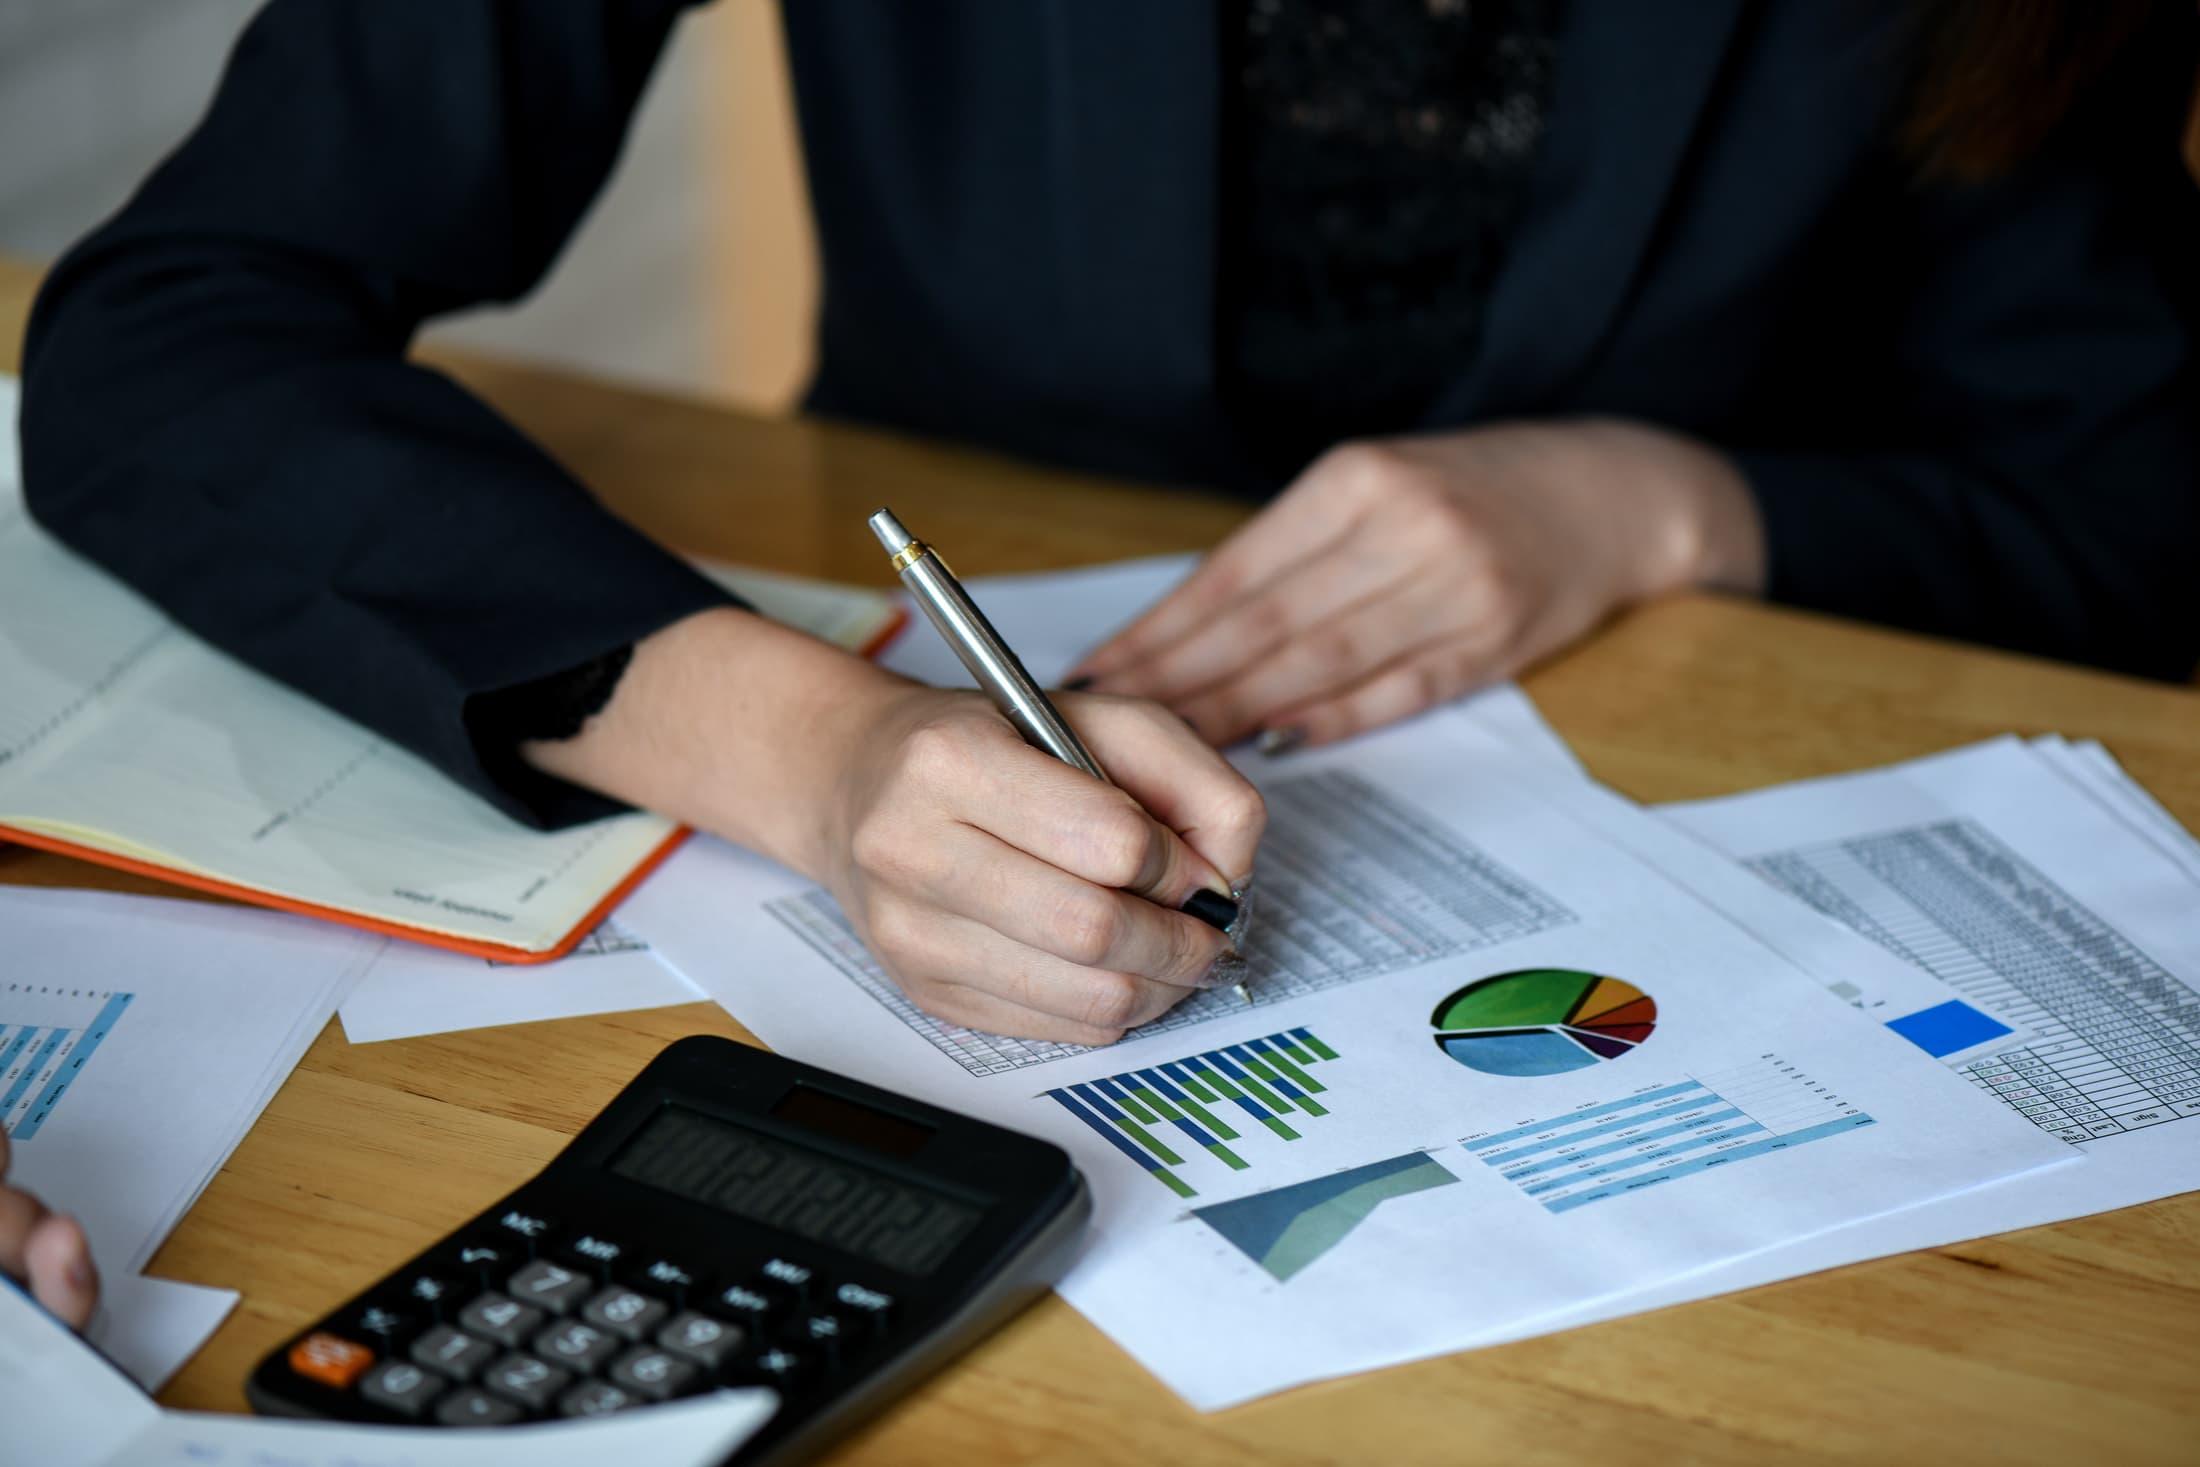 office staff analyze marketing data on the office LYP9AWU